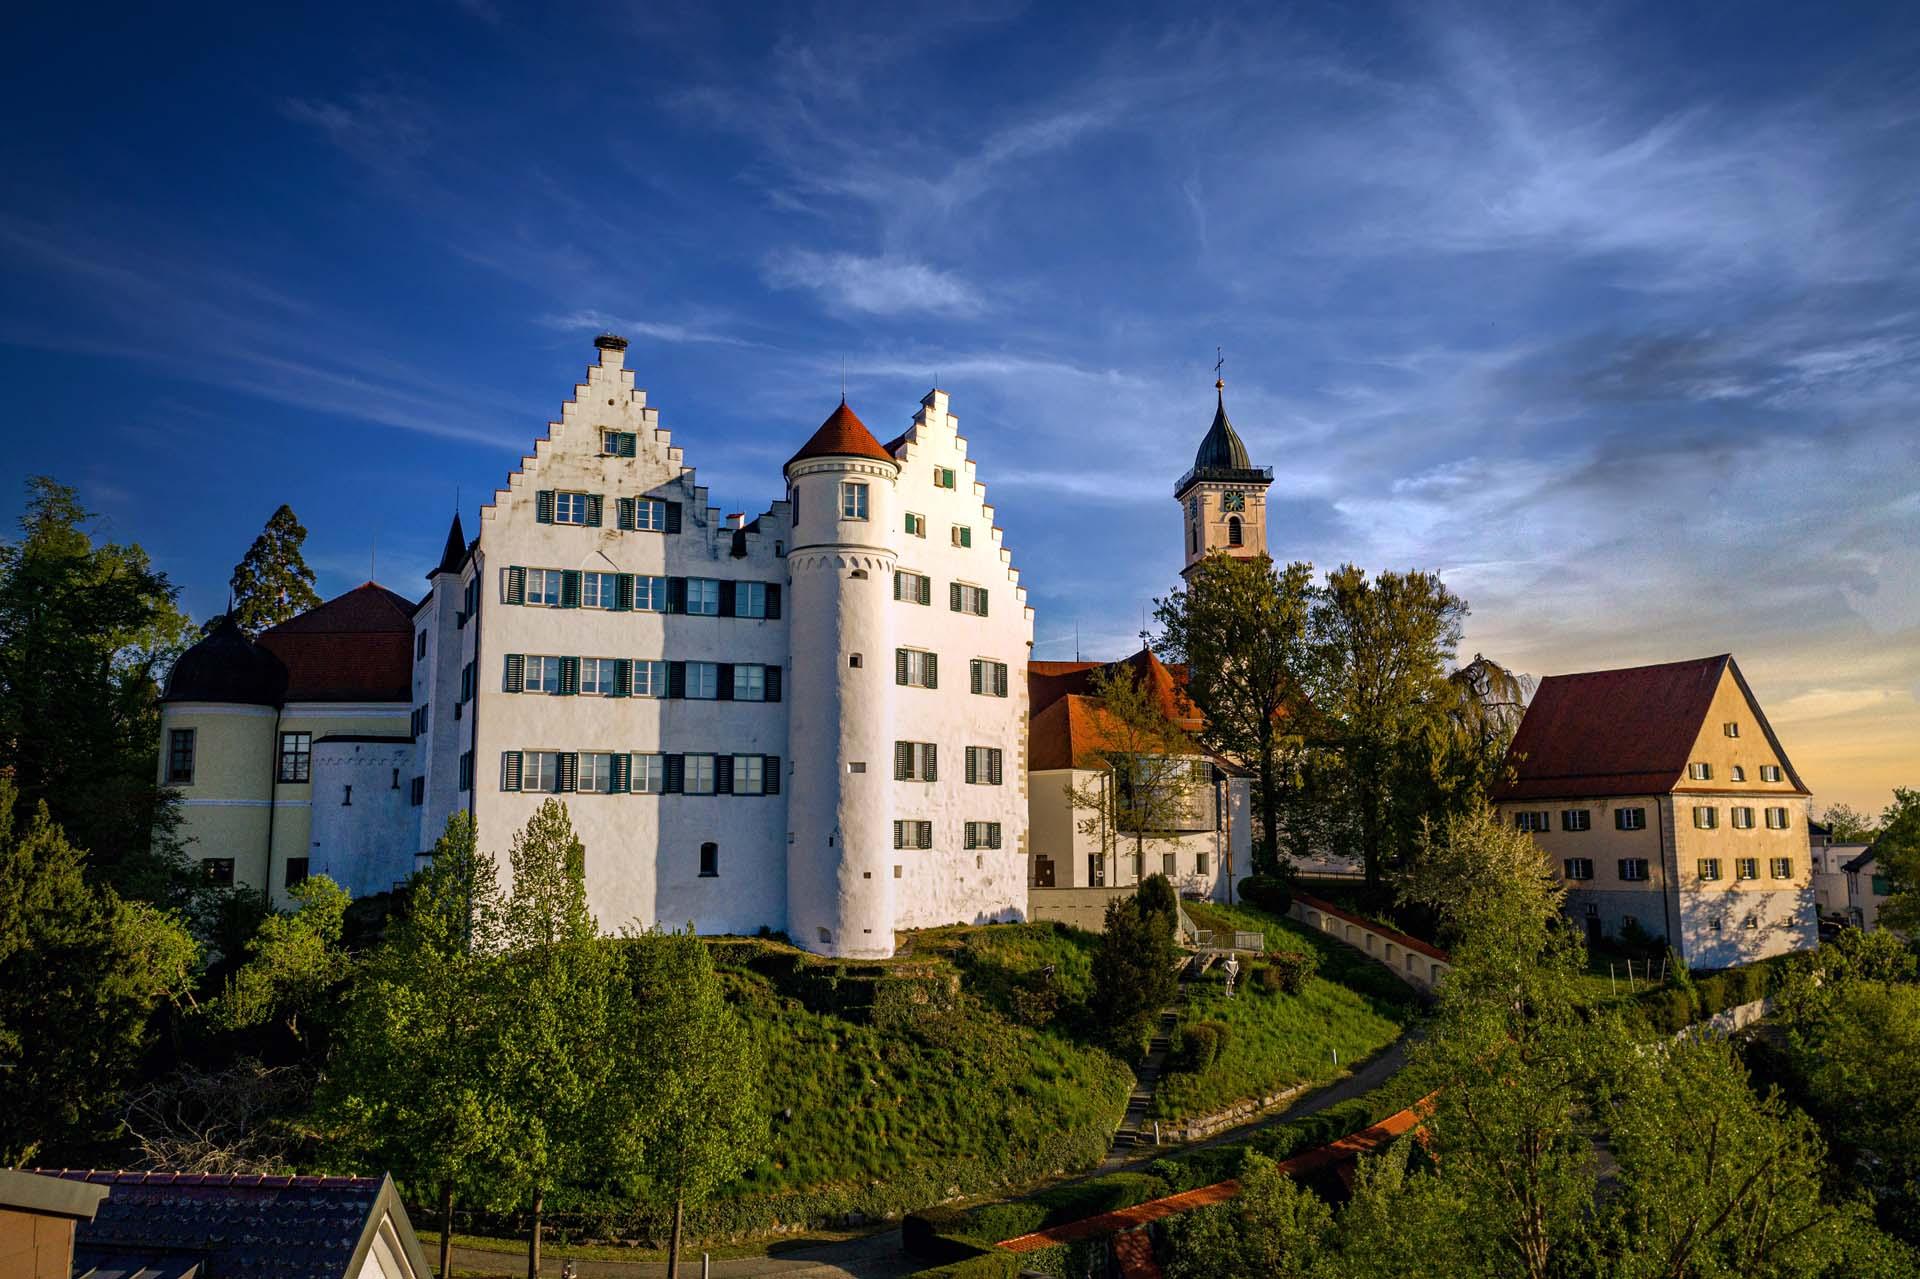 Blick auf das Schloss Aulendorf